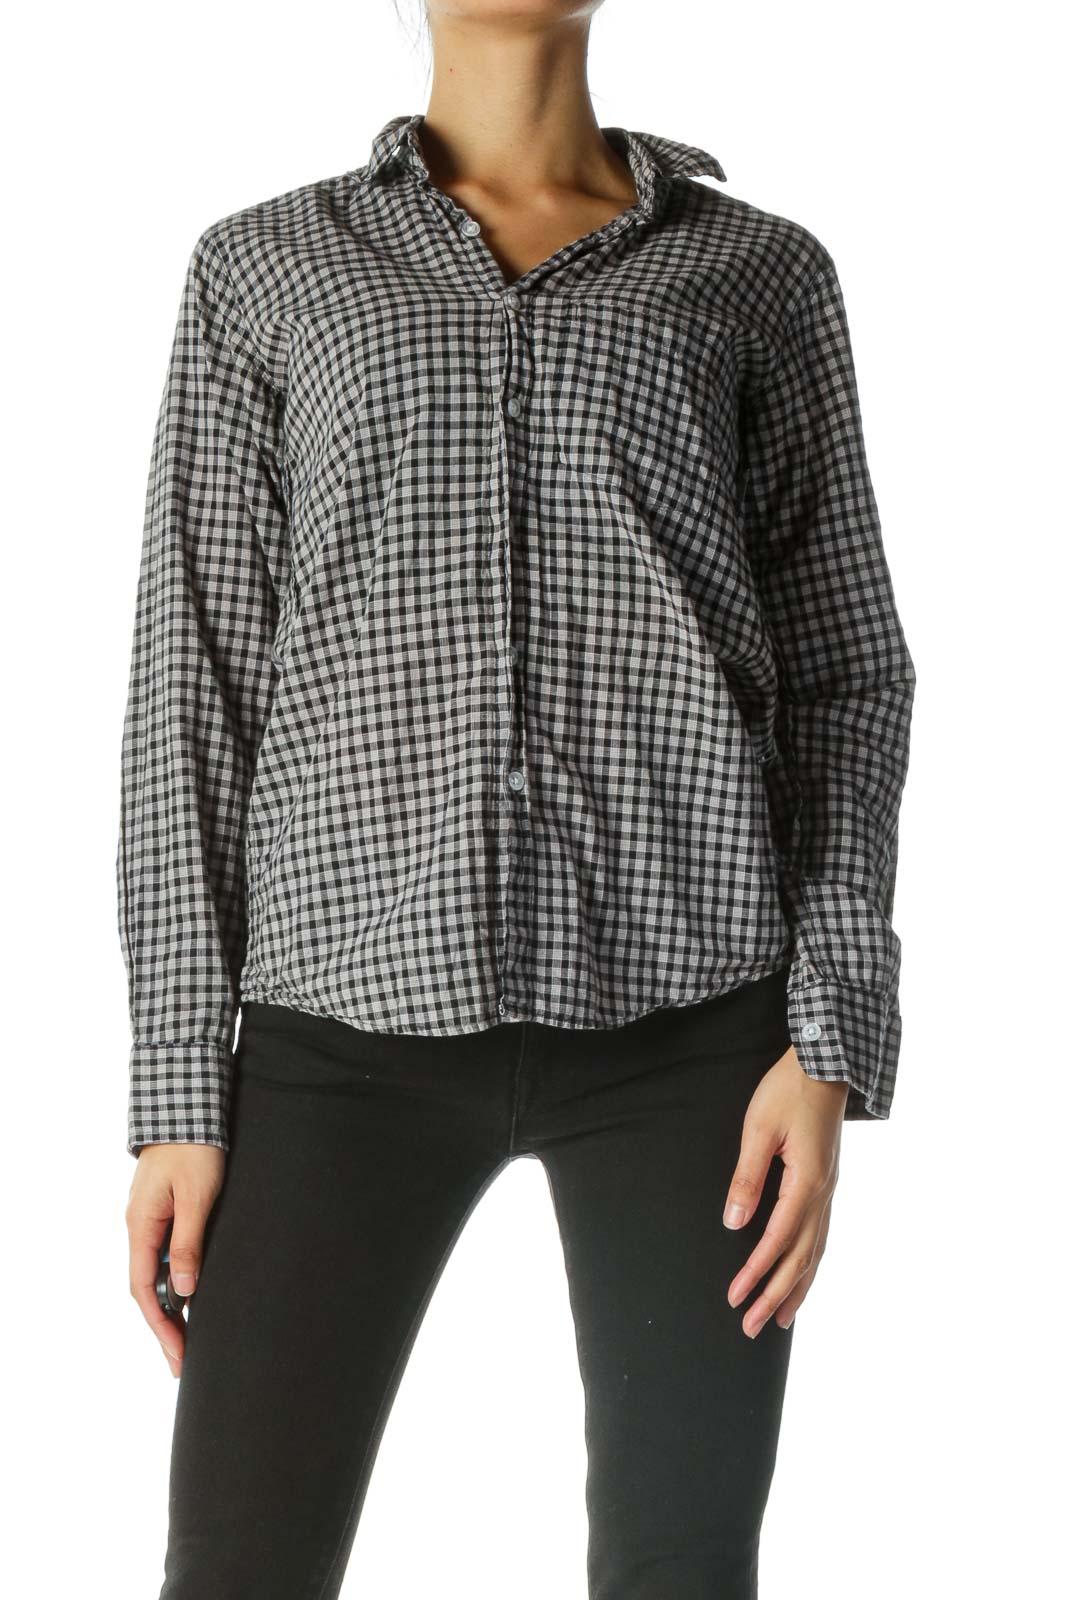 Black Gray 100% Cotton Shirt Front